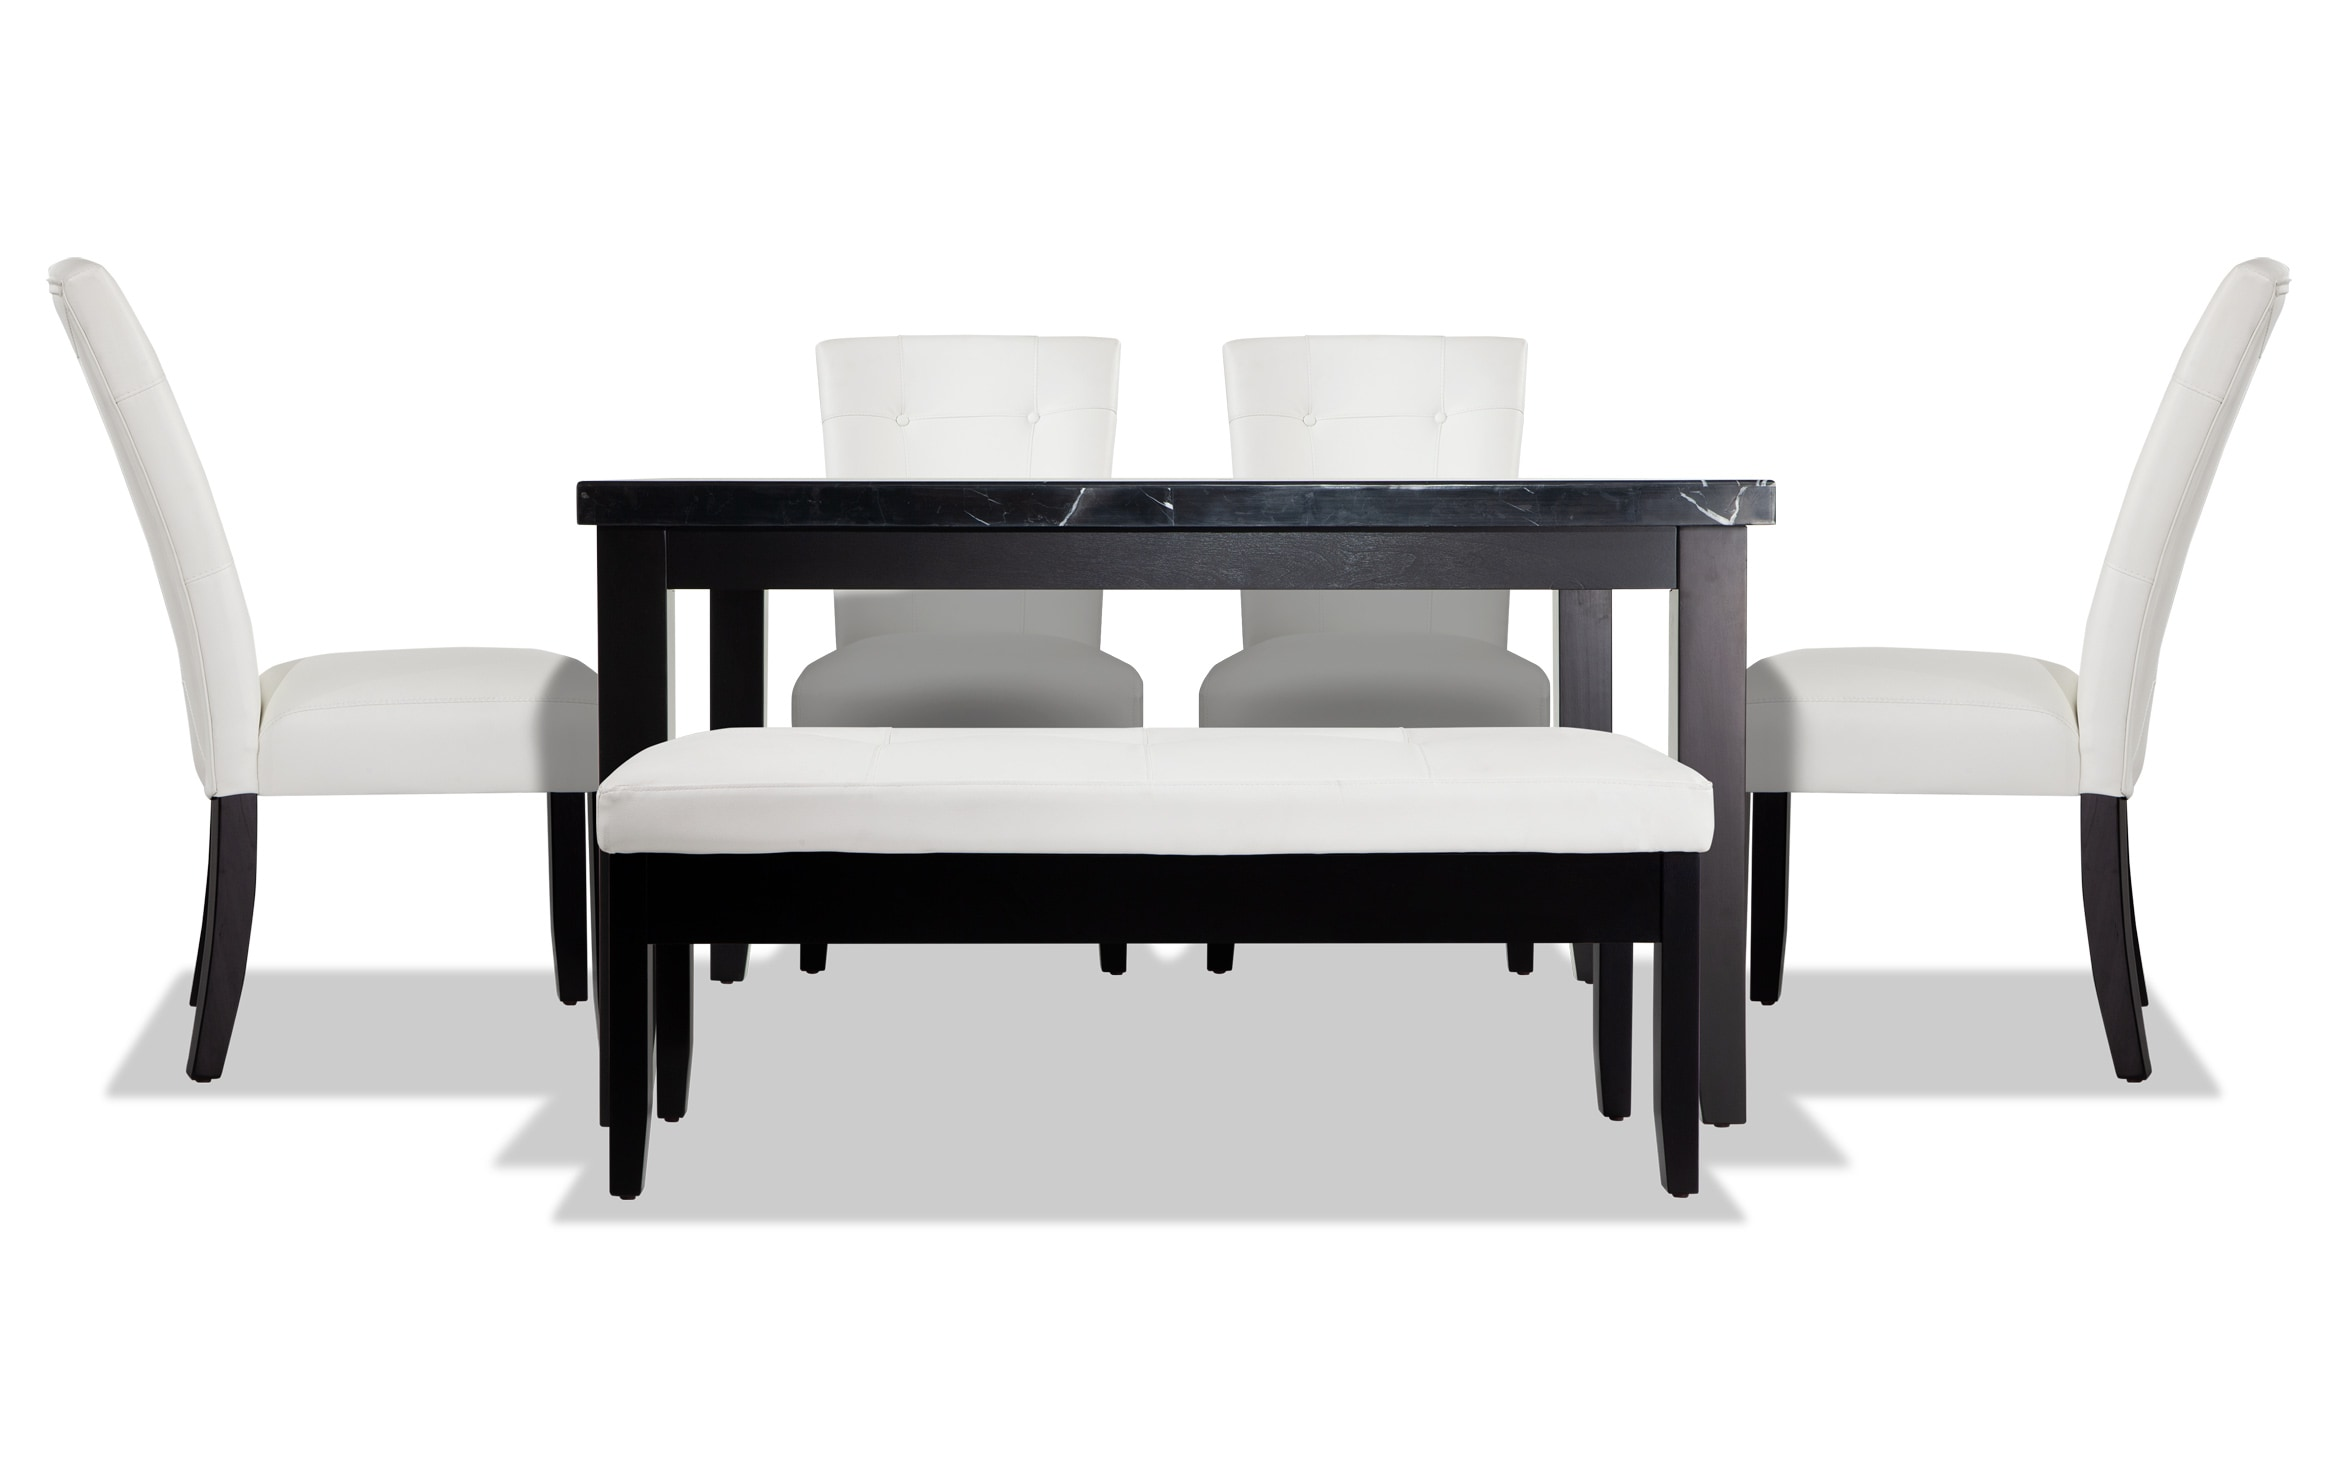 Montibello Black Marble 54 X 54 6 Piece Dining Set With Storage Bench Bobs Com